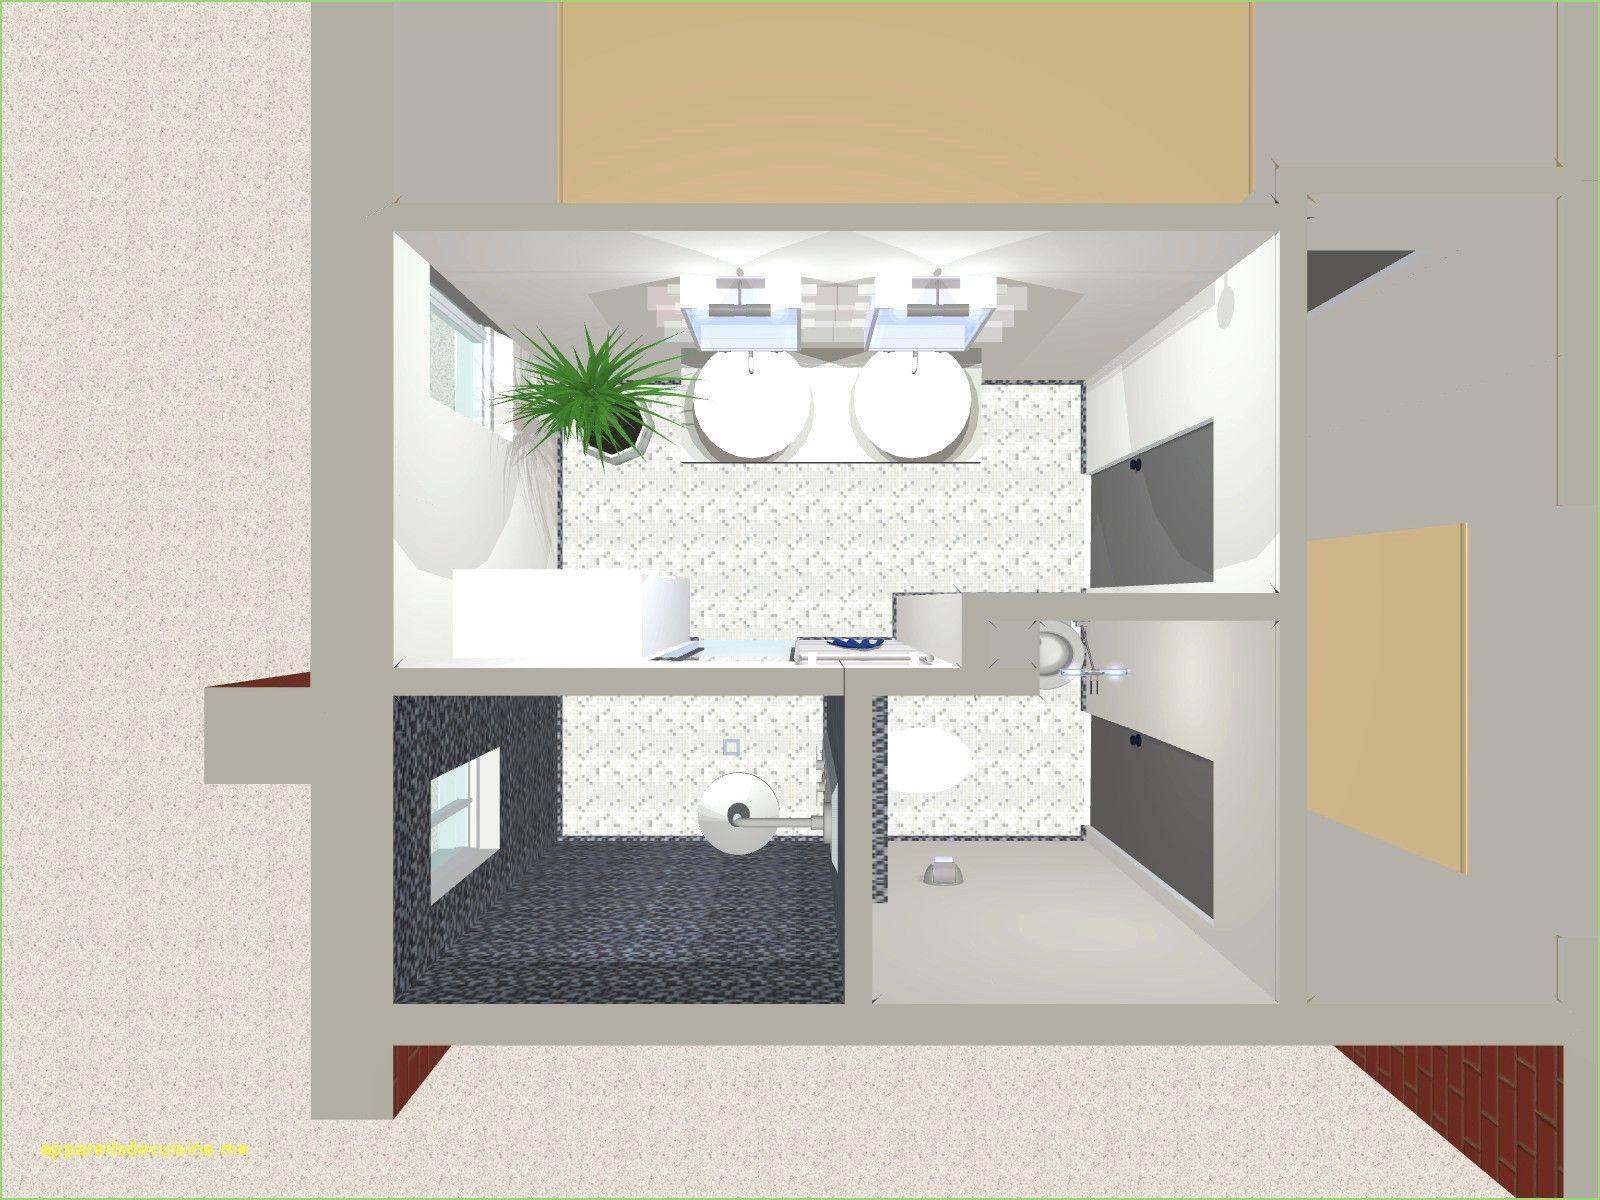 Best Of Logiciel Plan Salle De Bain 20d Gratuit  Shelves in